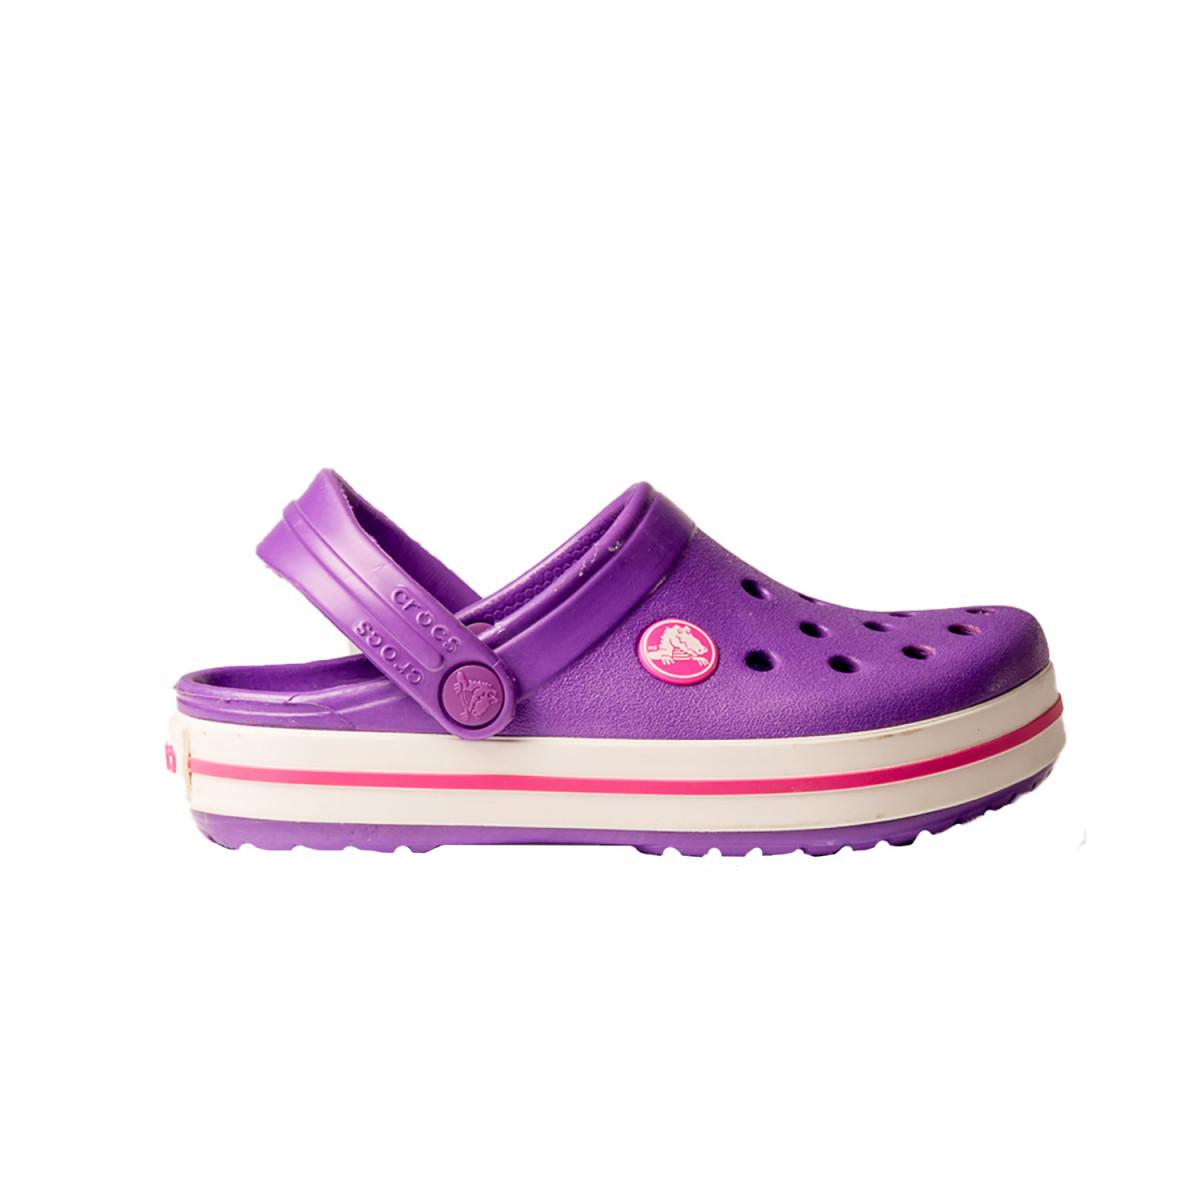 Zuecos Crocs Crocband Kids